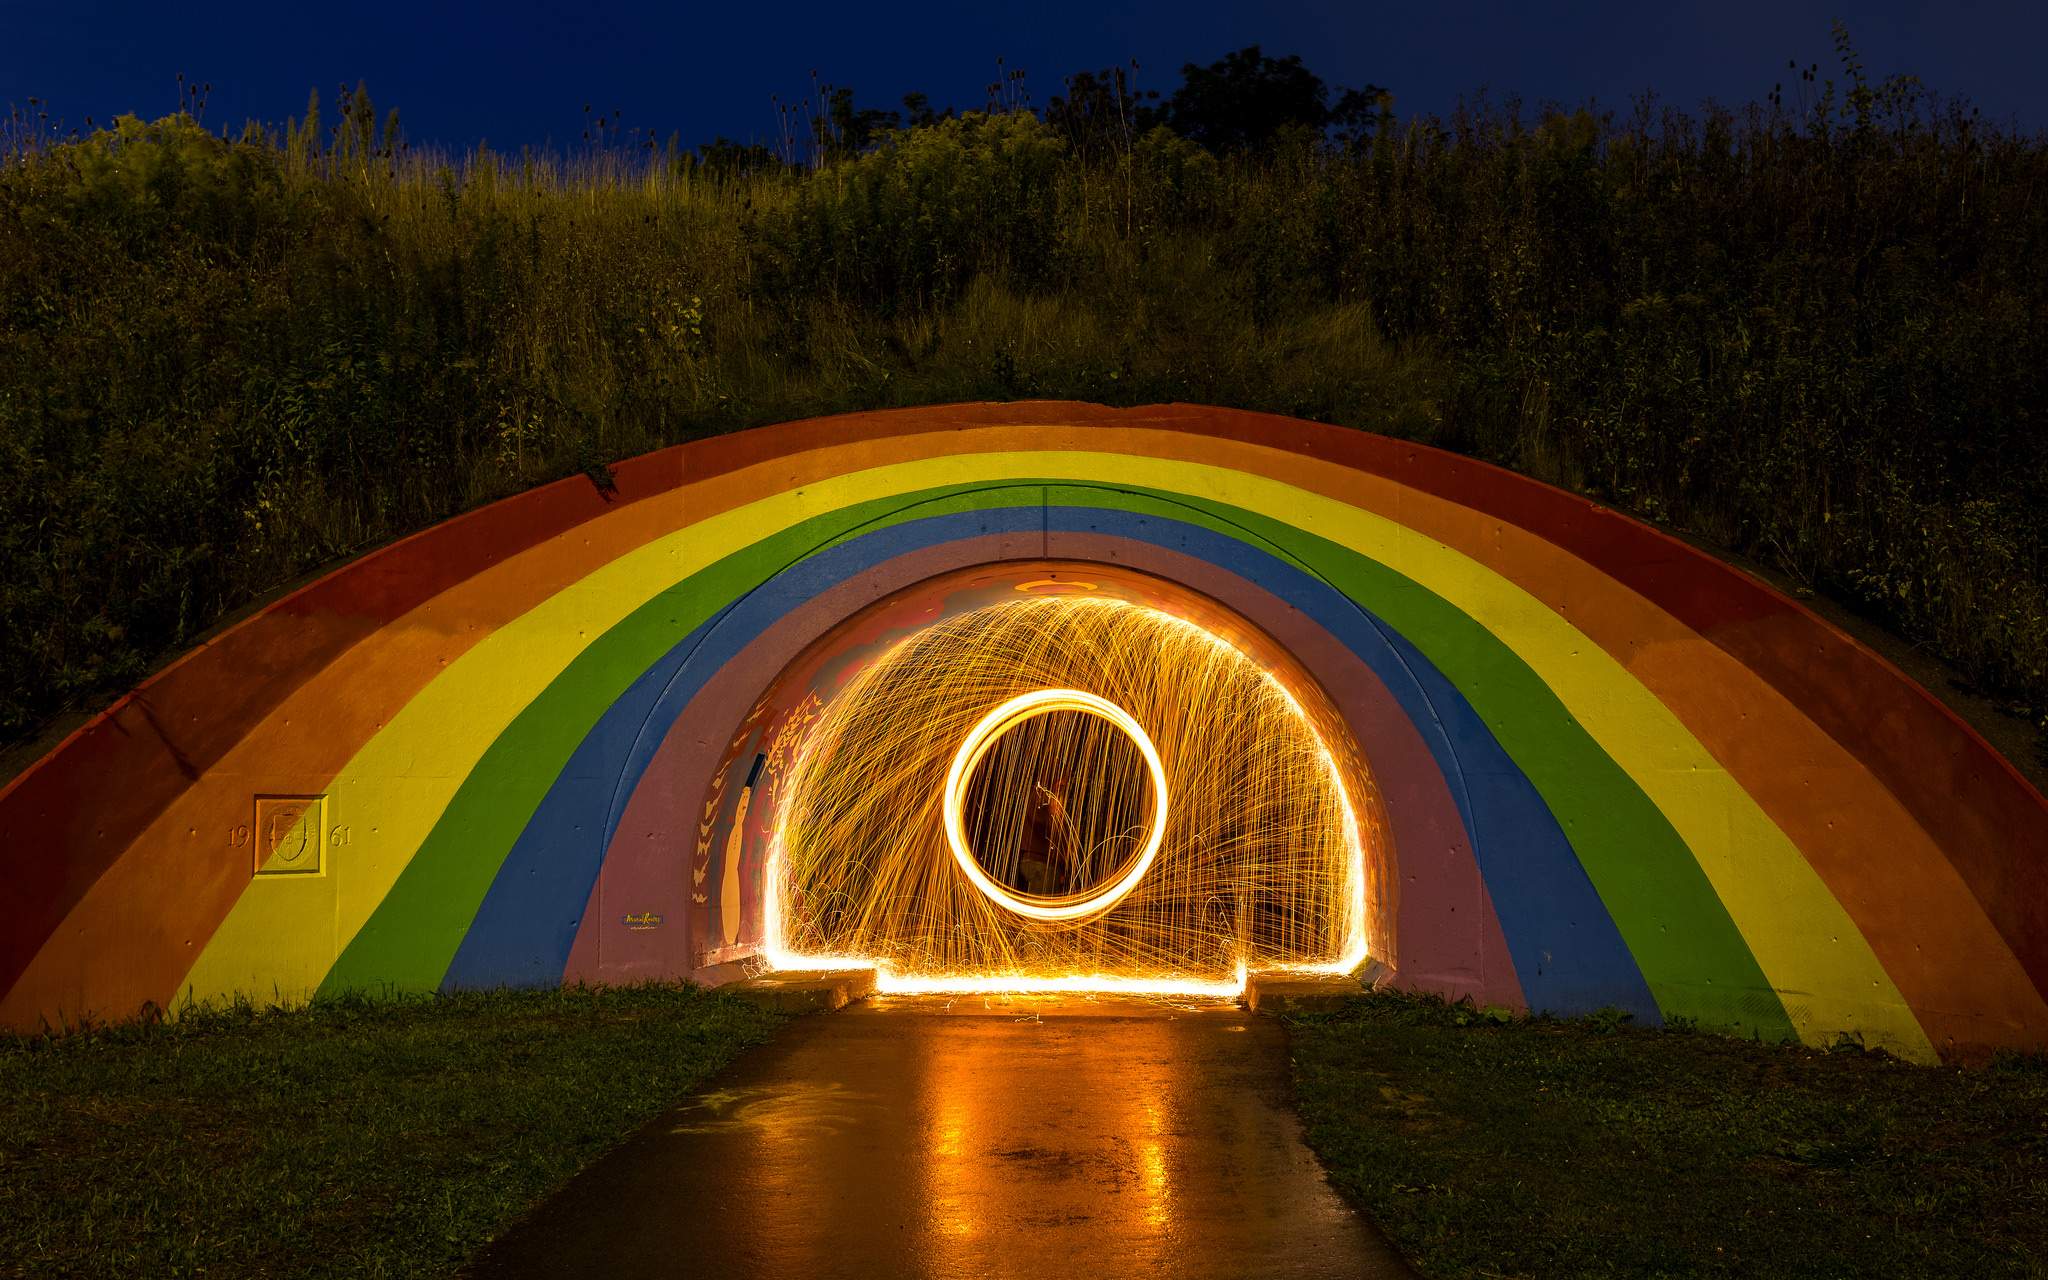 Berg Johnson's Rainbow